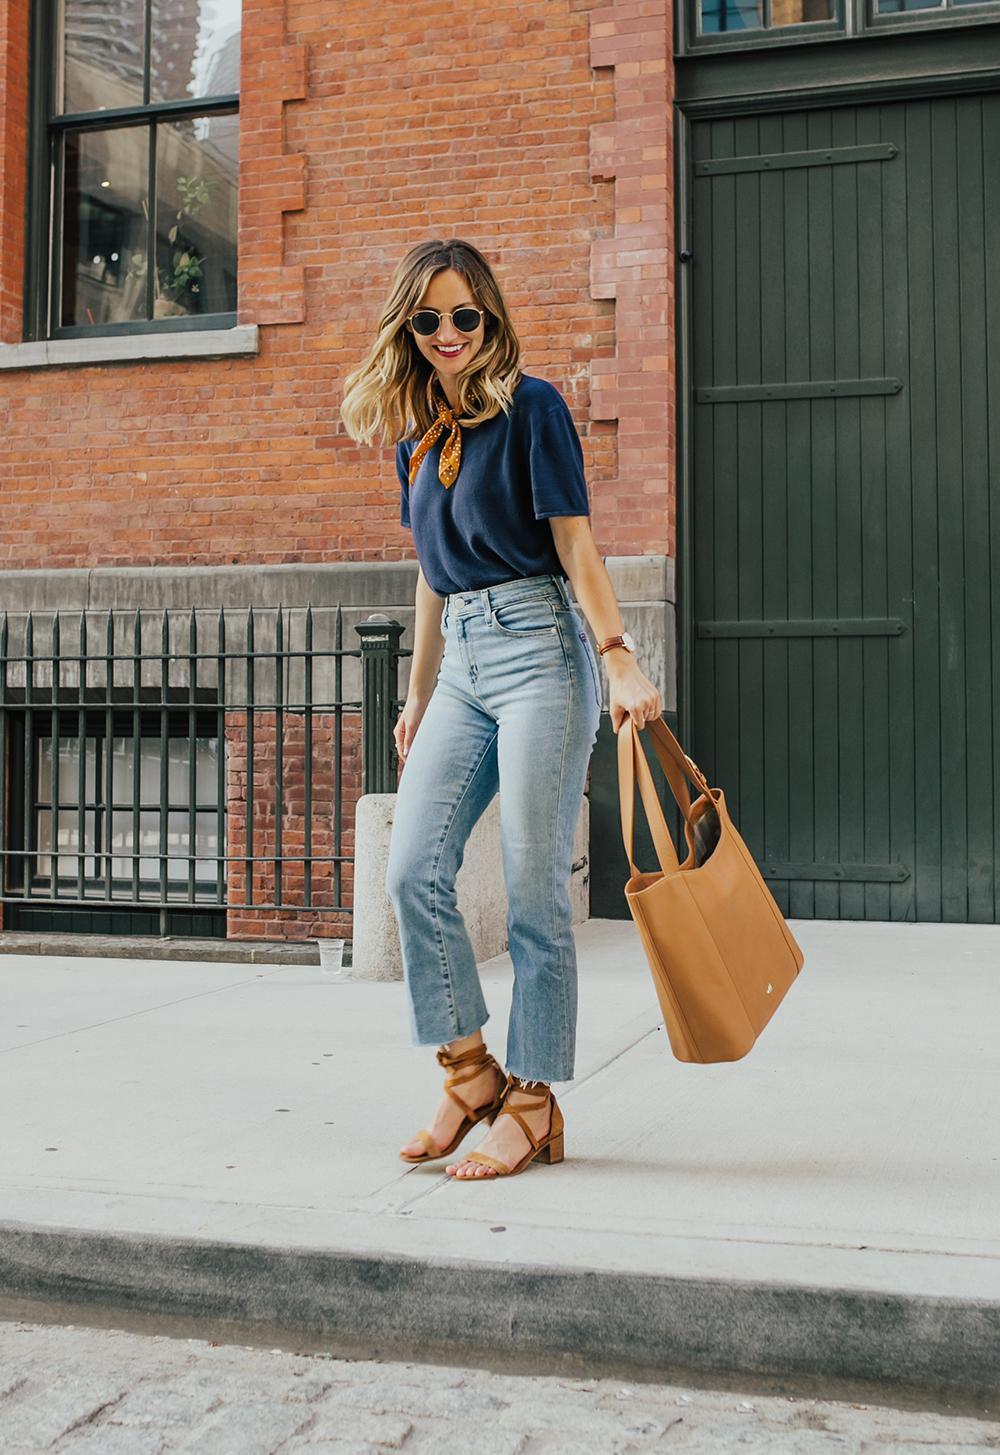 livvyland-blog-olivia-watson-nyc-tribeca-mom-jeans-brahmin-tan-charleston-tote-neckerchief-3